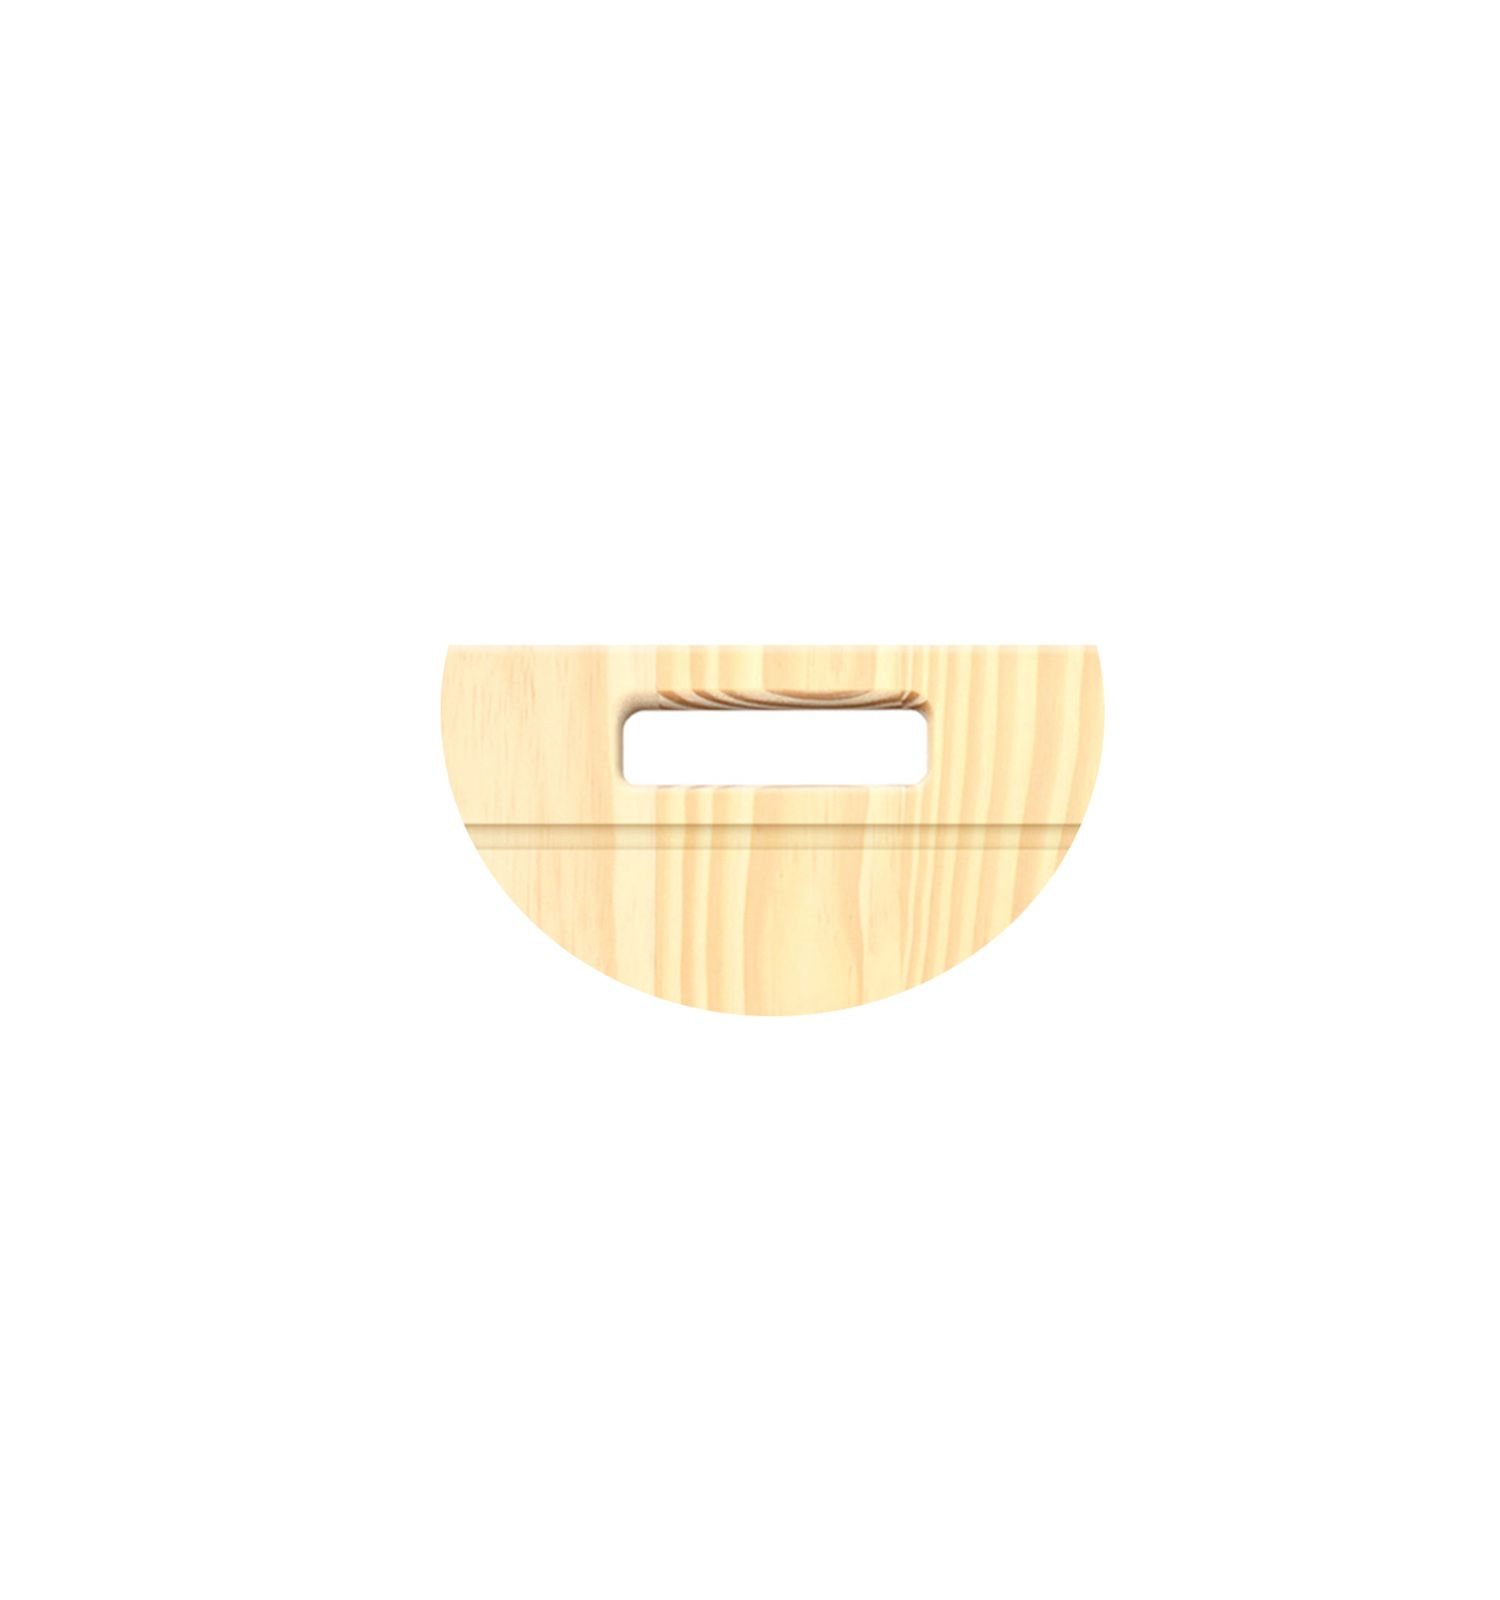 Tabua de Carne Pinus com Canaleta 35x21